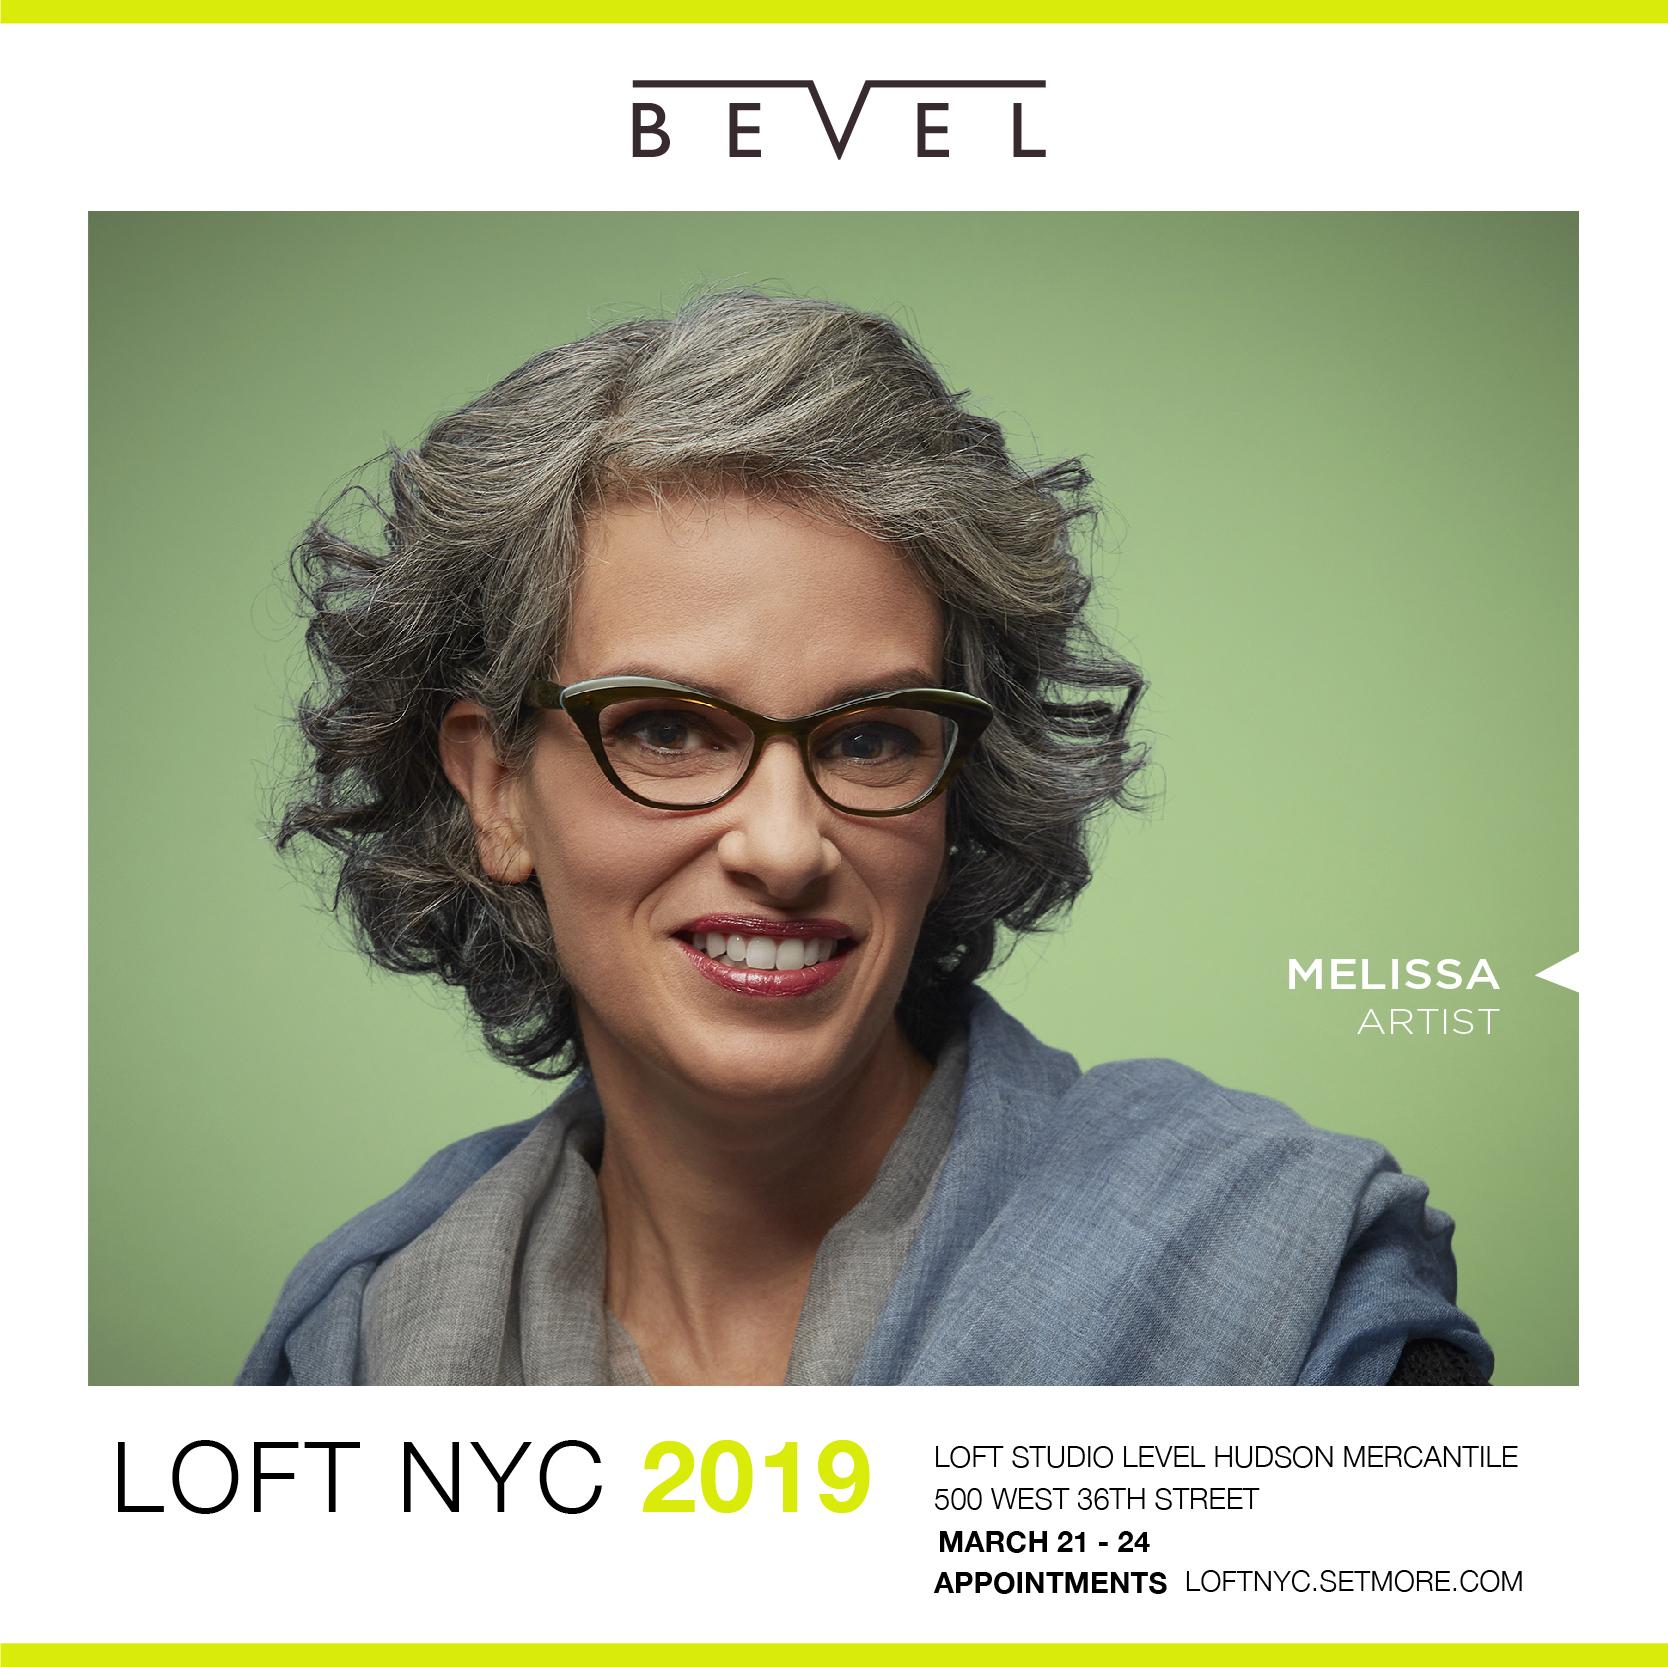 LOFT NYC 2019